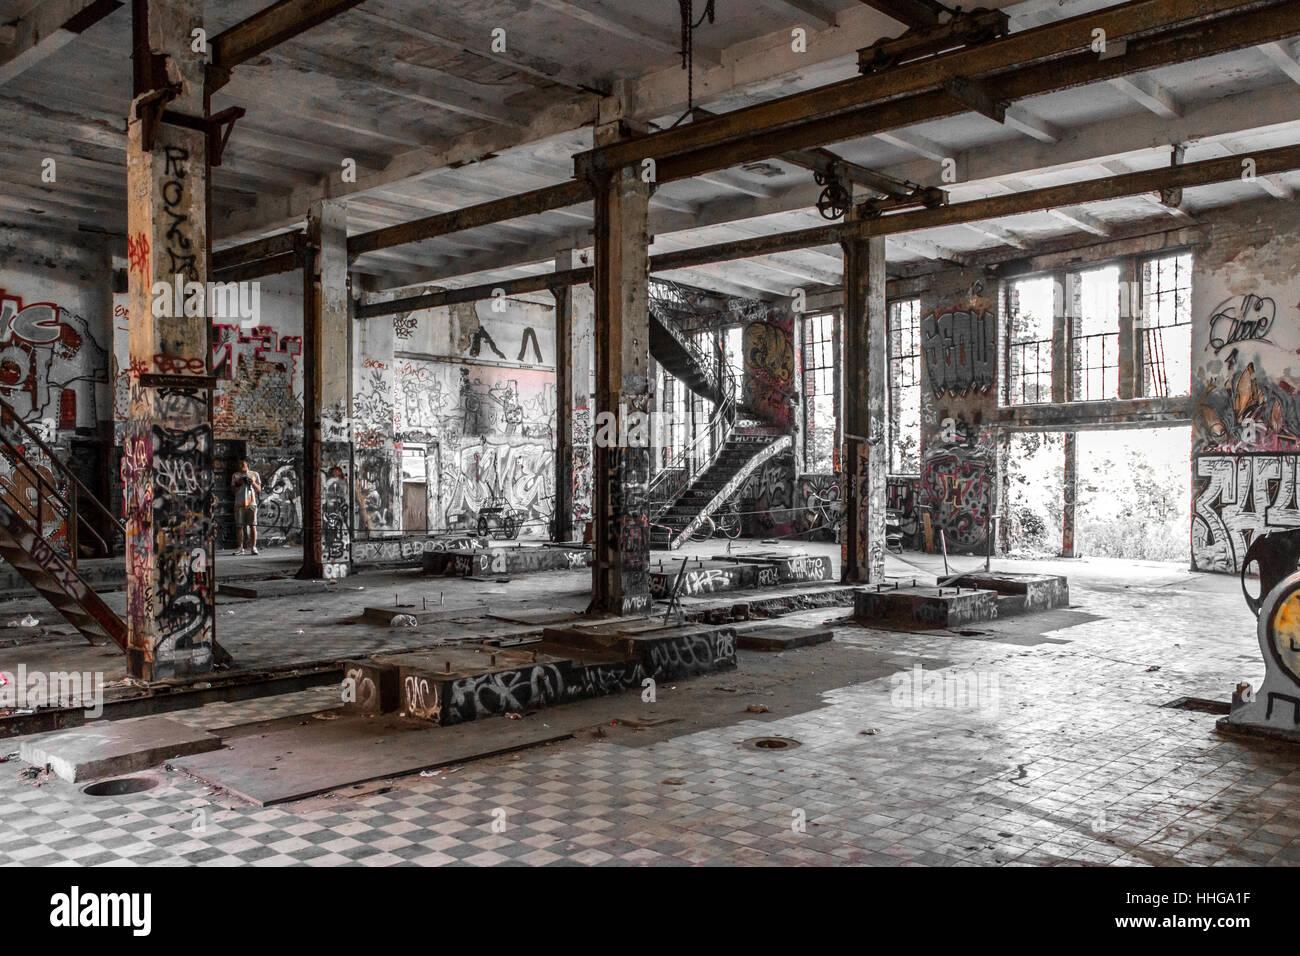 Rundown Building Decay Stock Photos Rundown: Empty Room In Abandoned Factory Ruin